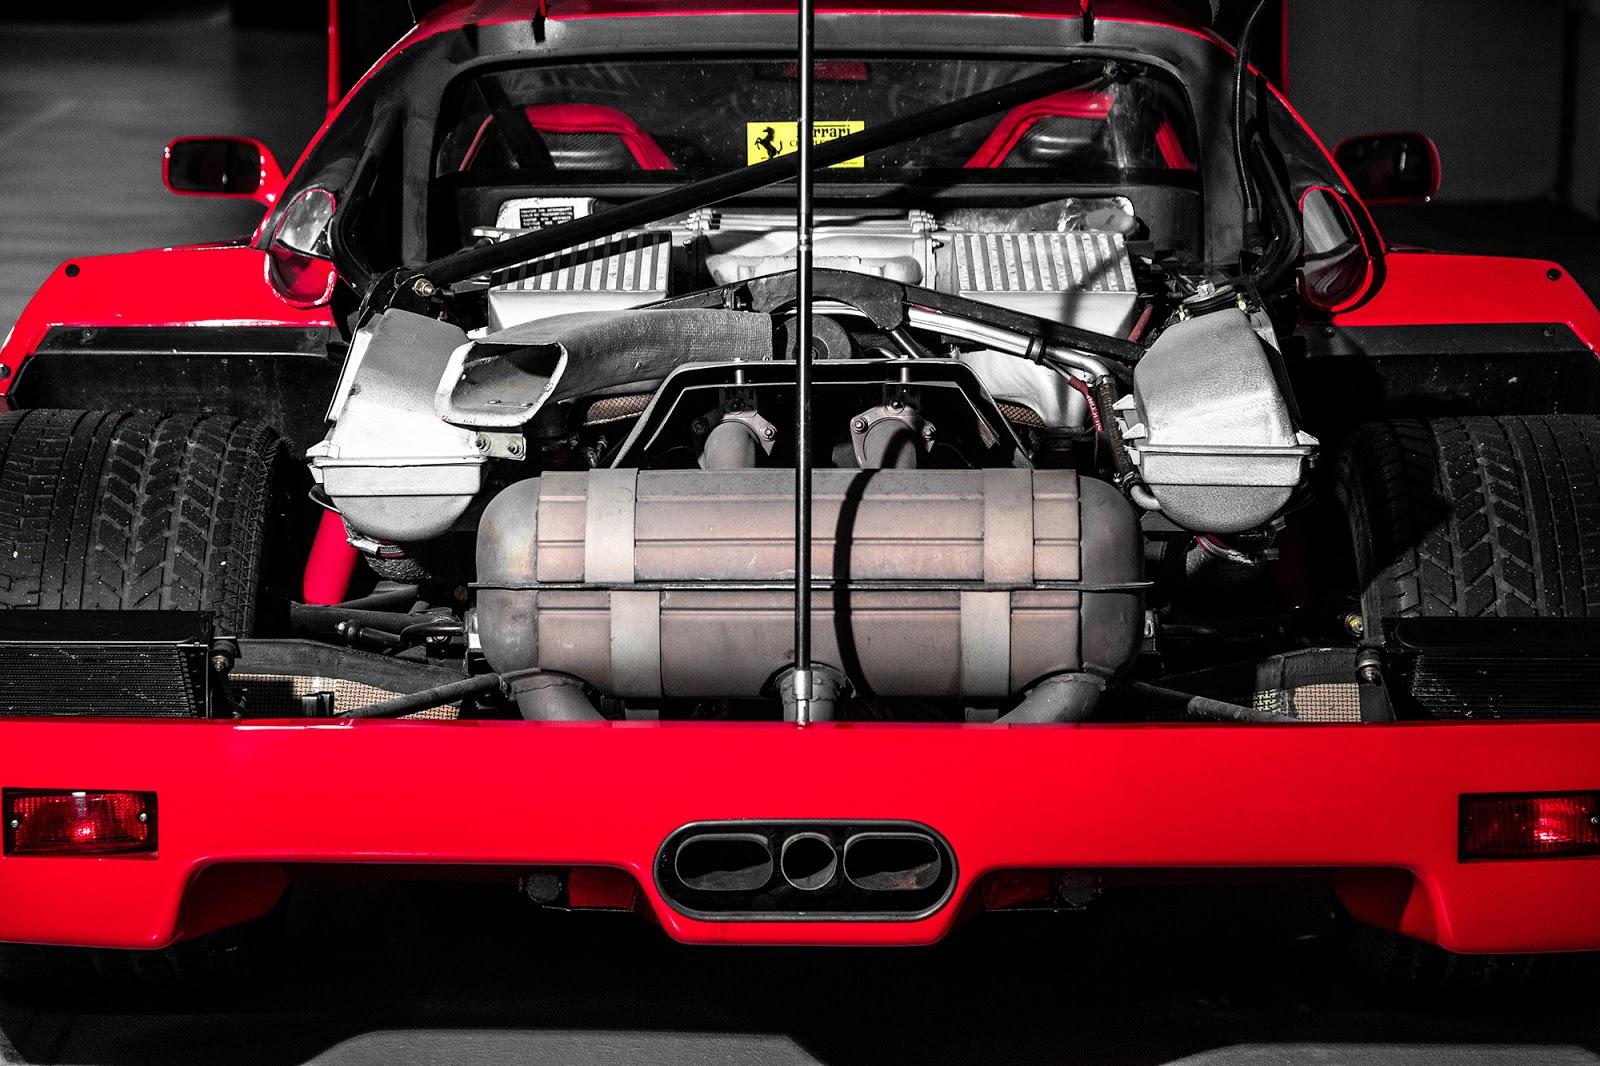 MK5 4905 F40. O μύθος, ο θρύλος F40, Ferrari, Ferrari F40, retrocar, retrocar sunday, zblog